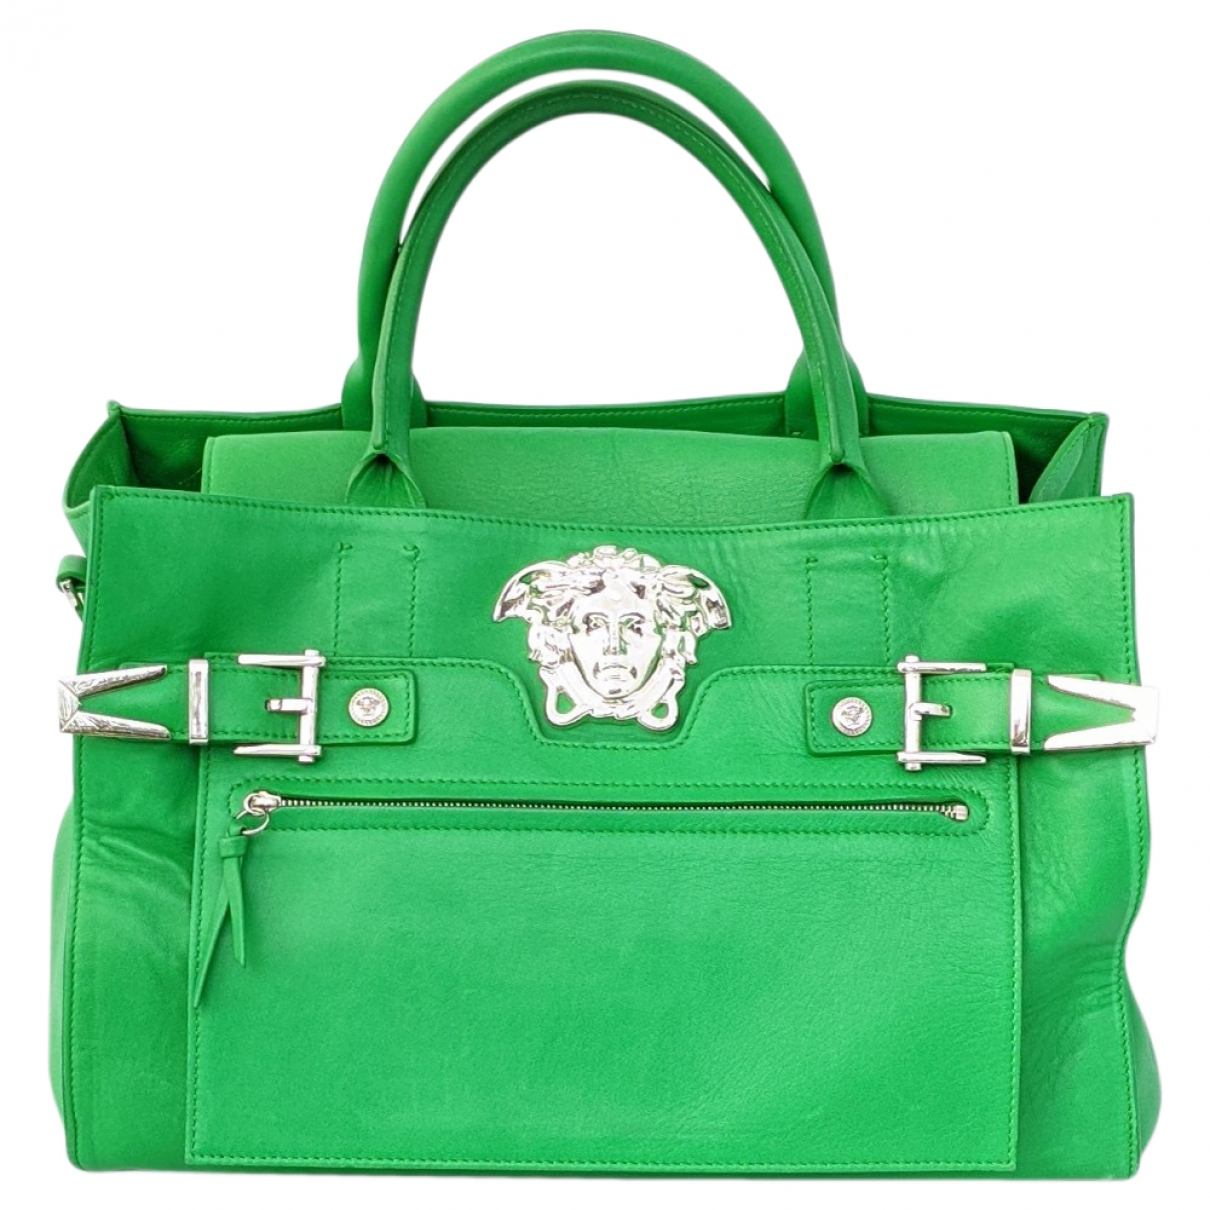 Versace \N Green Leather handbag for Women \N